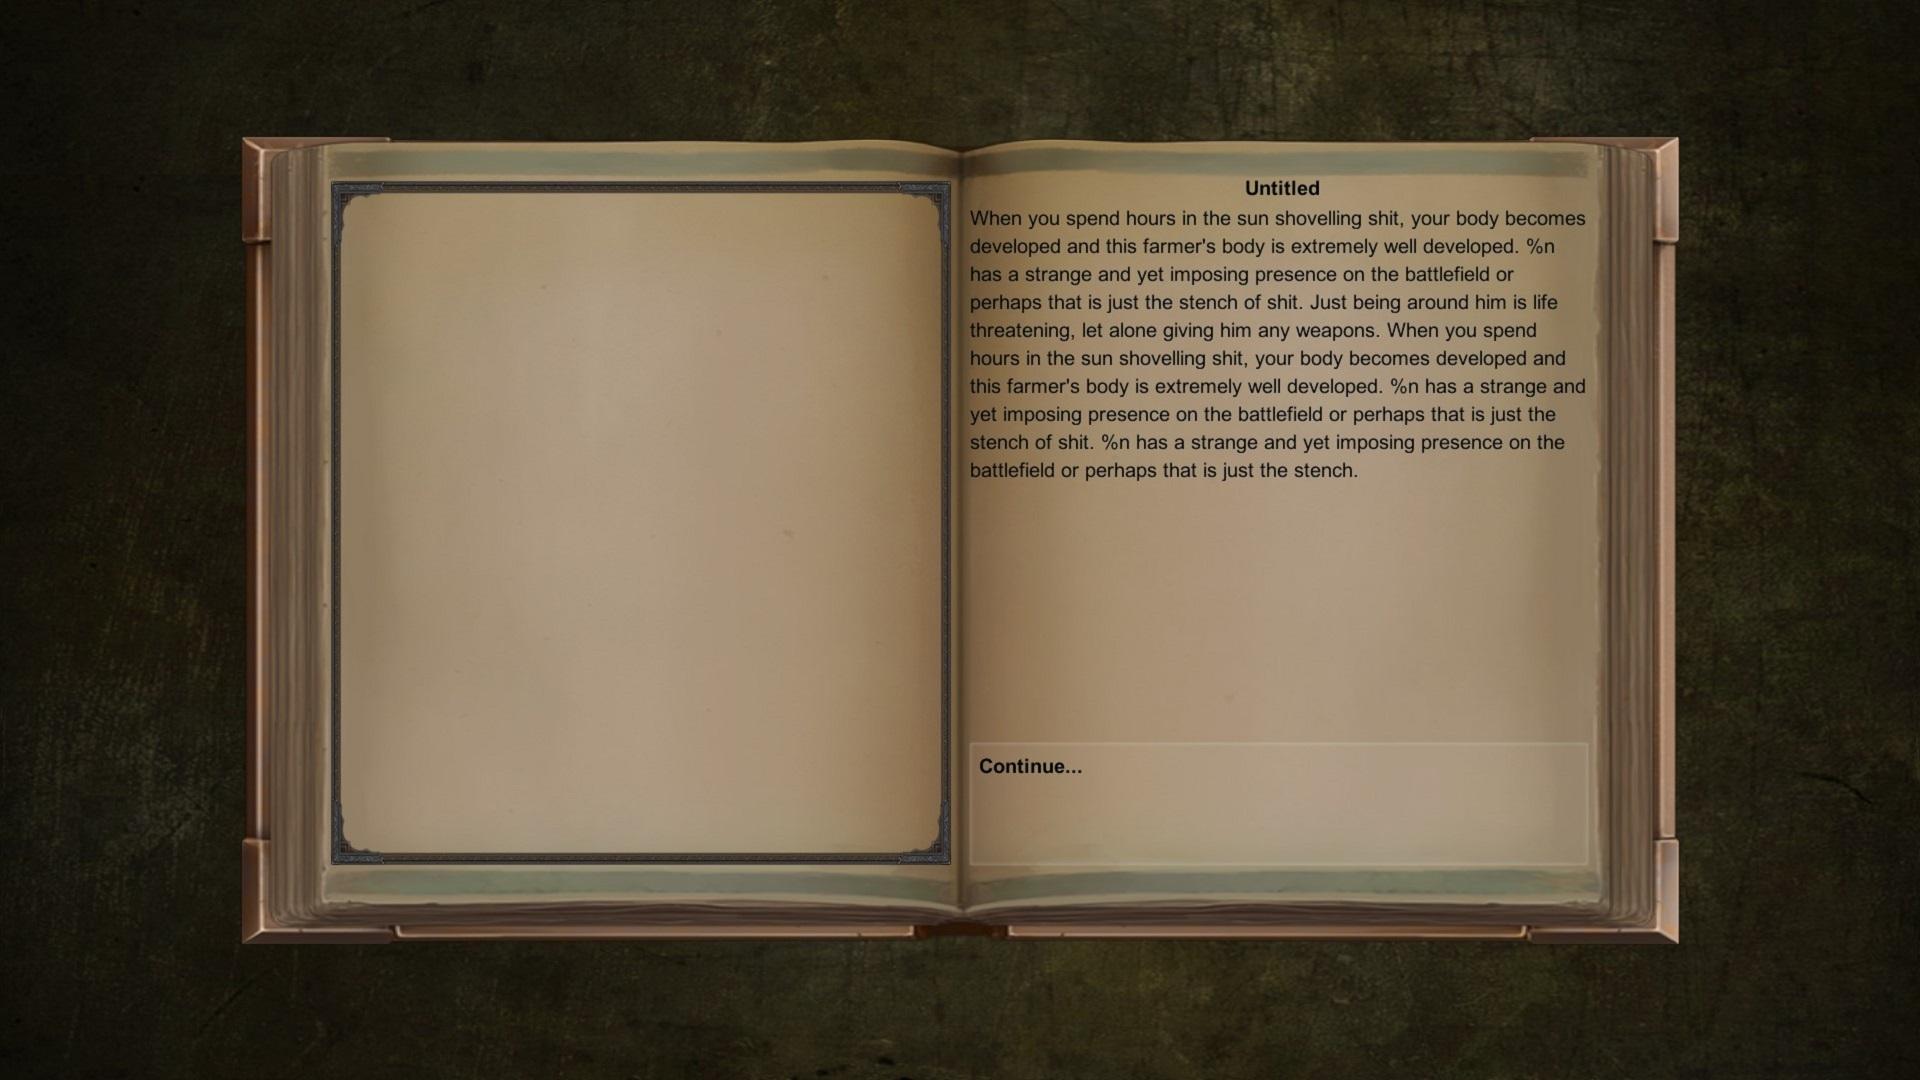 83f7822bcfdbfa947512ce44a0709edc5b61f9f9 | RPG Jeuxvidéo